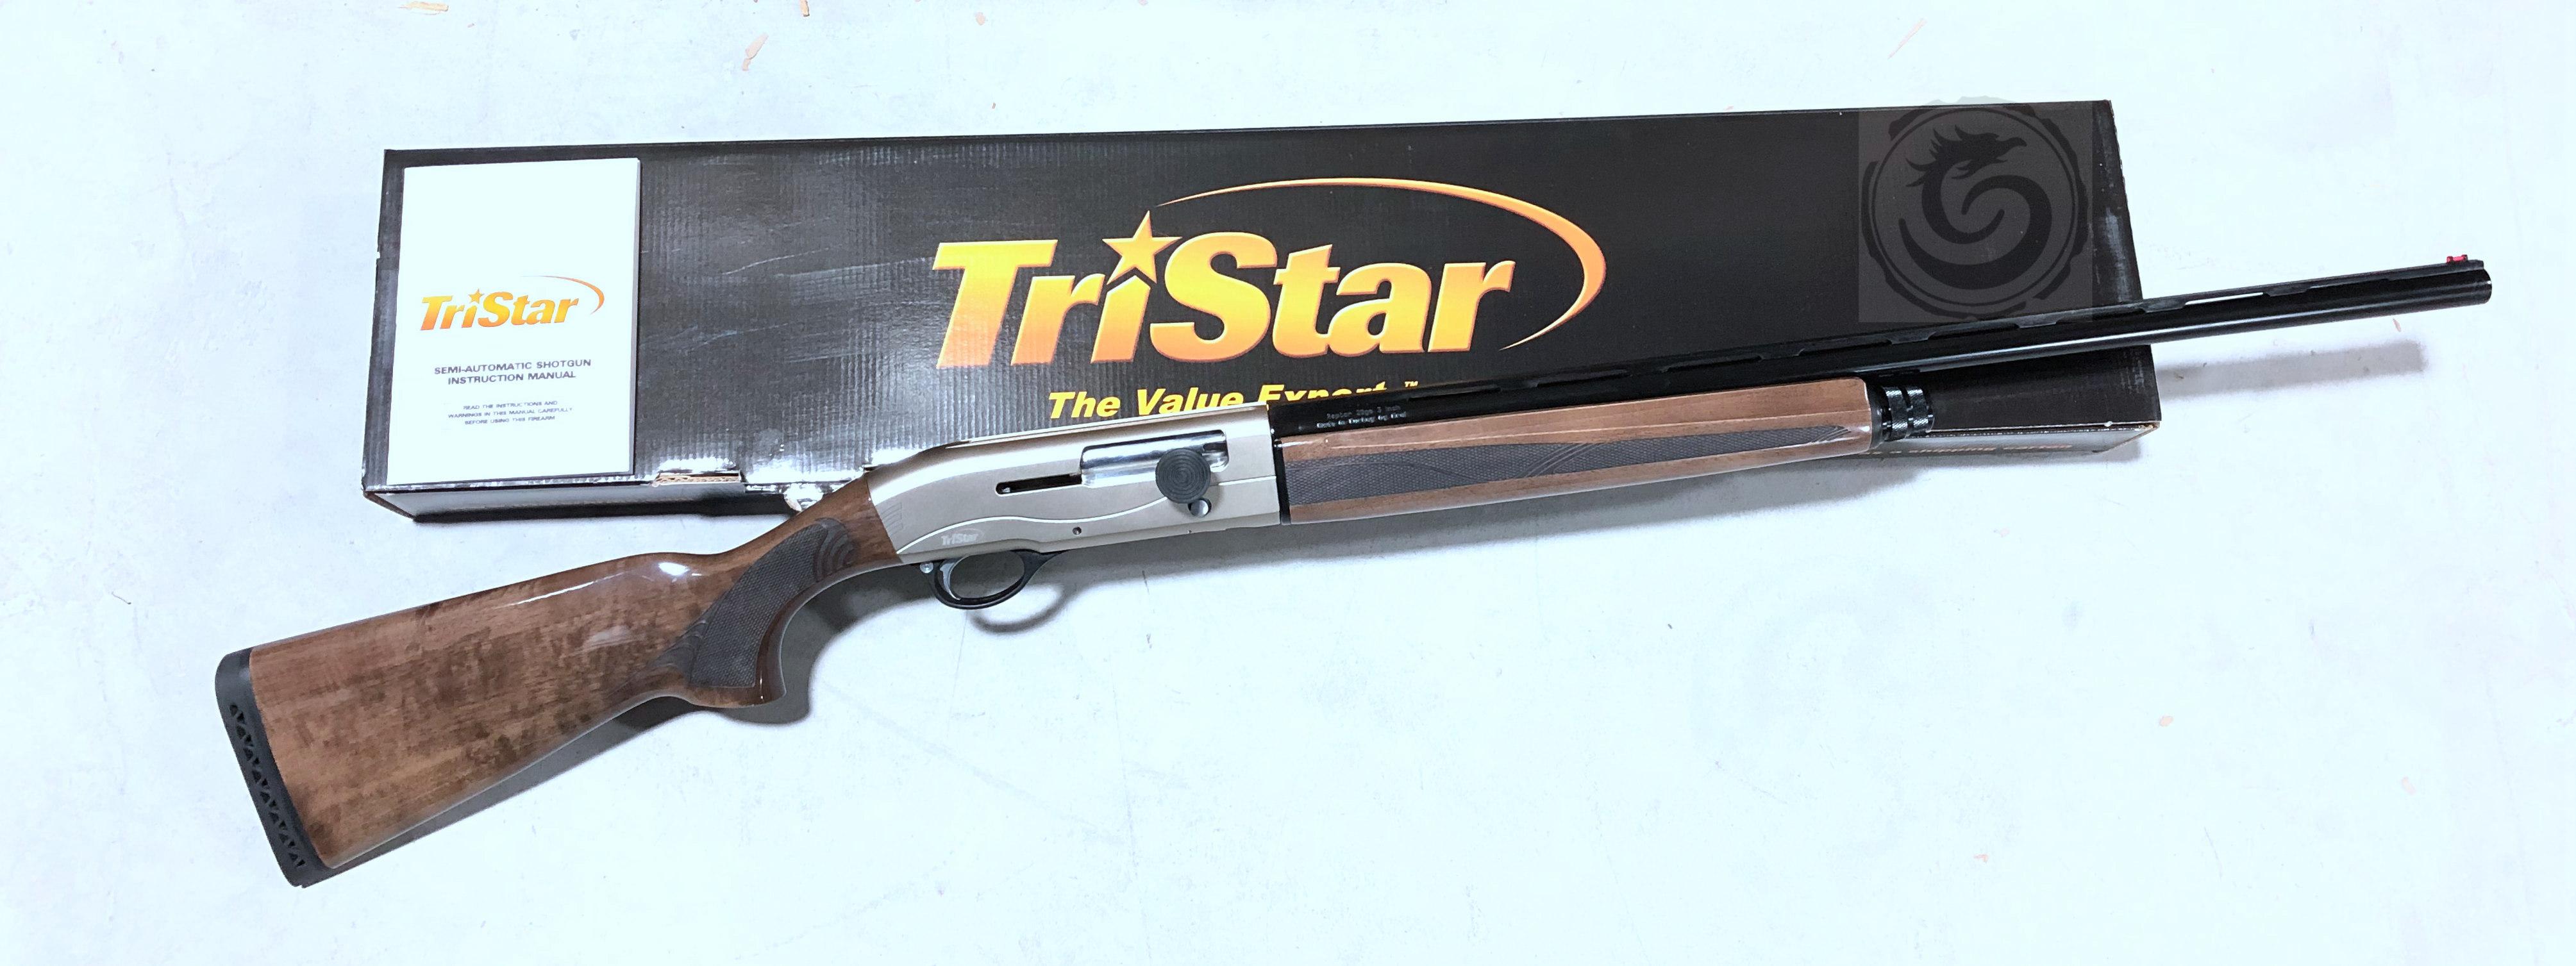 TRISTAR RAPTOR SEMI AUTO SHOTGUN 12 GA 28″ BARREL, WOOD STOCK